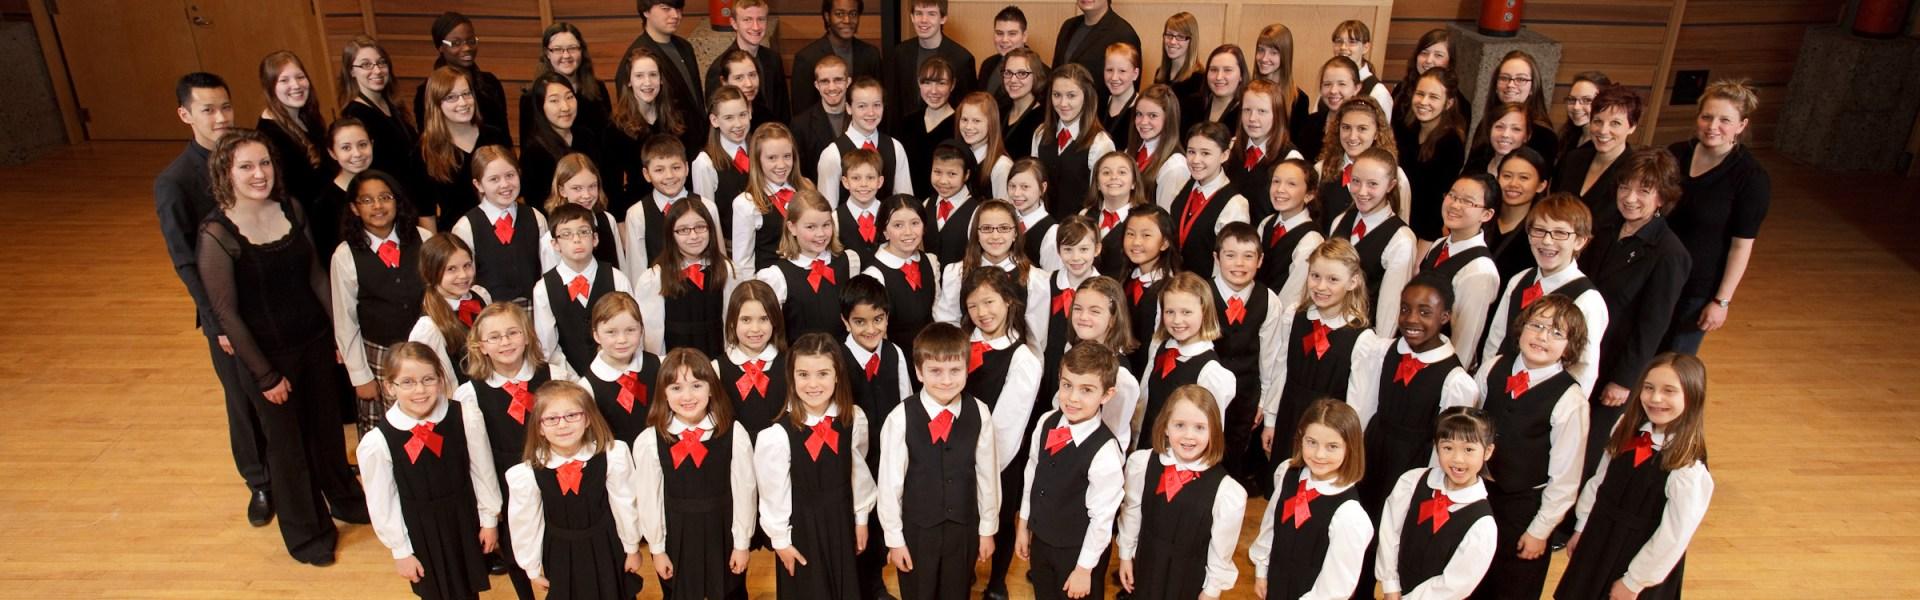 = calgary childrens choir